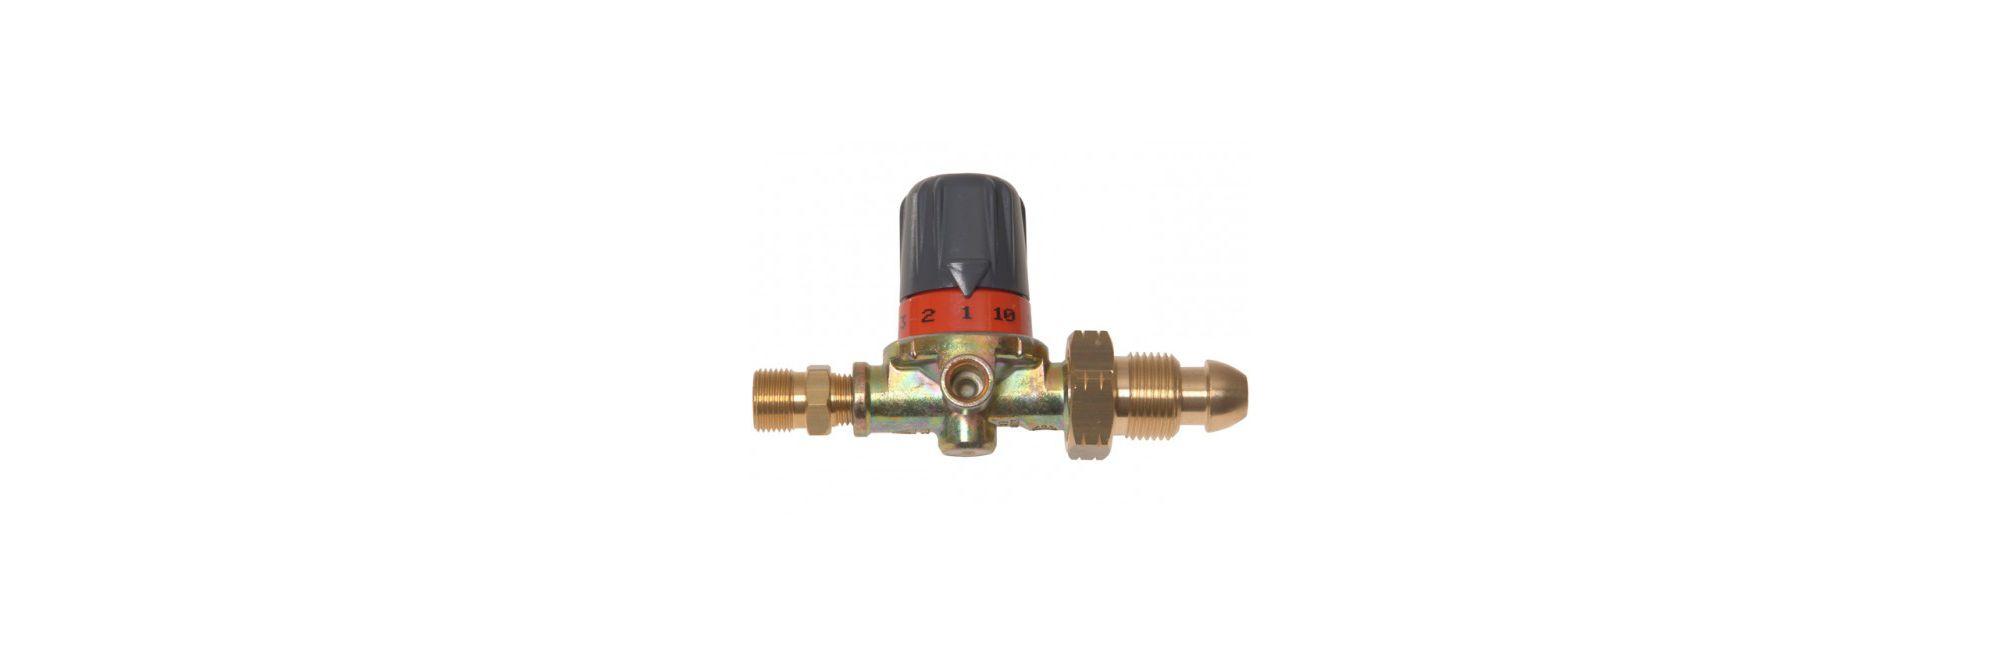 0-4 bar Adjustable h/p LPG Regulator 3/8 BSP